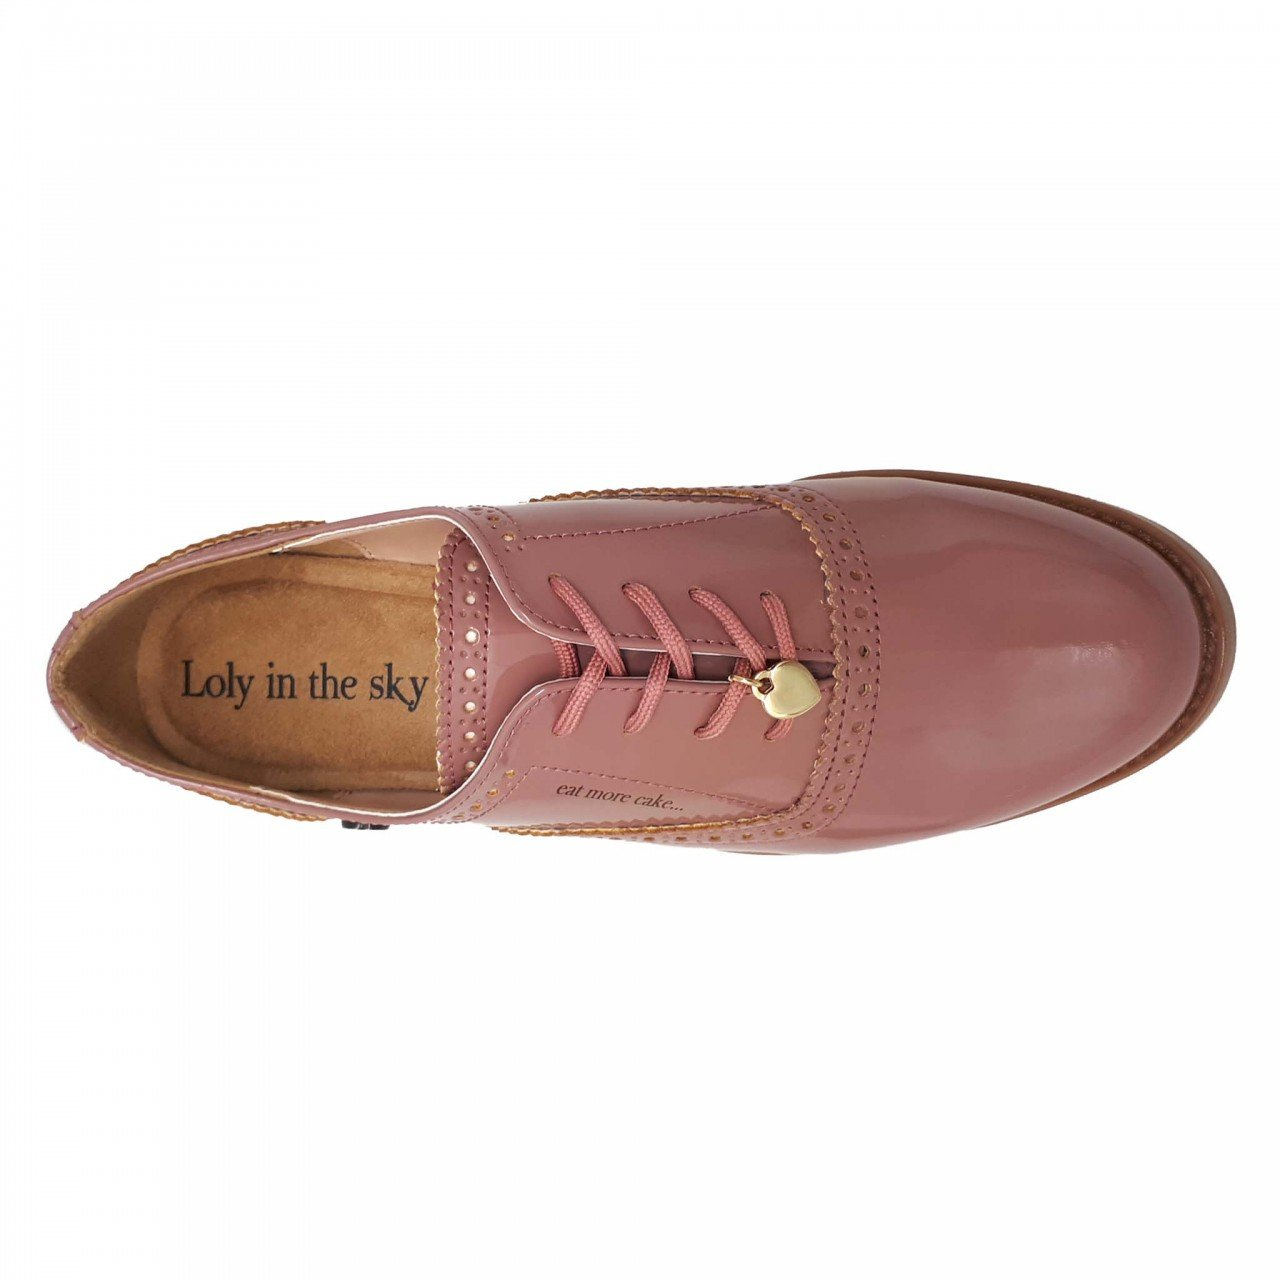 Zapato charol rosa para mujer Ebrill Loly in the sky